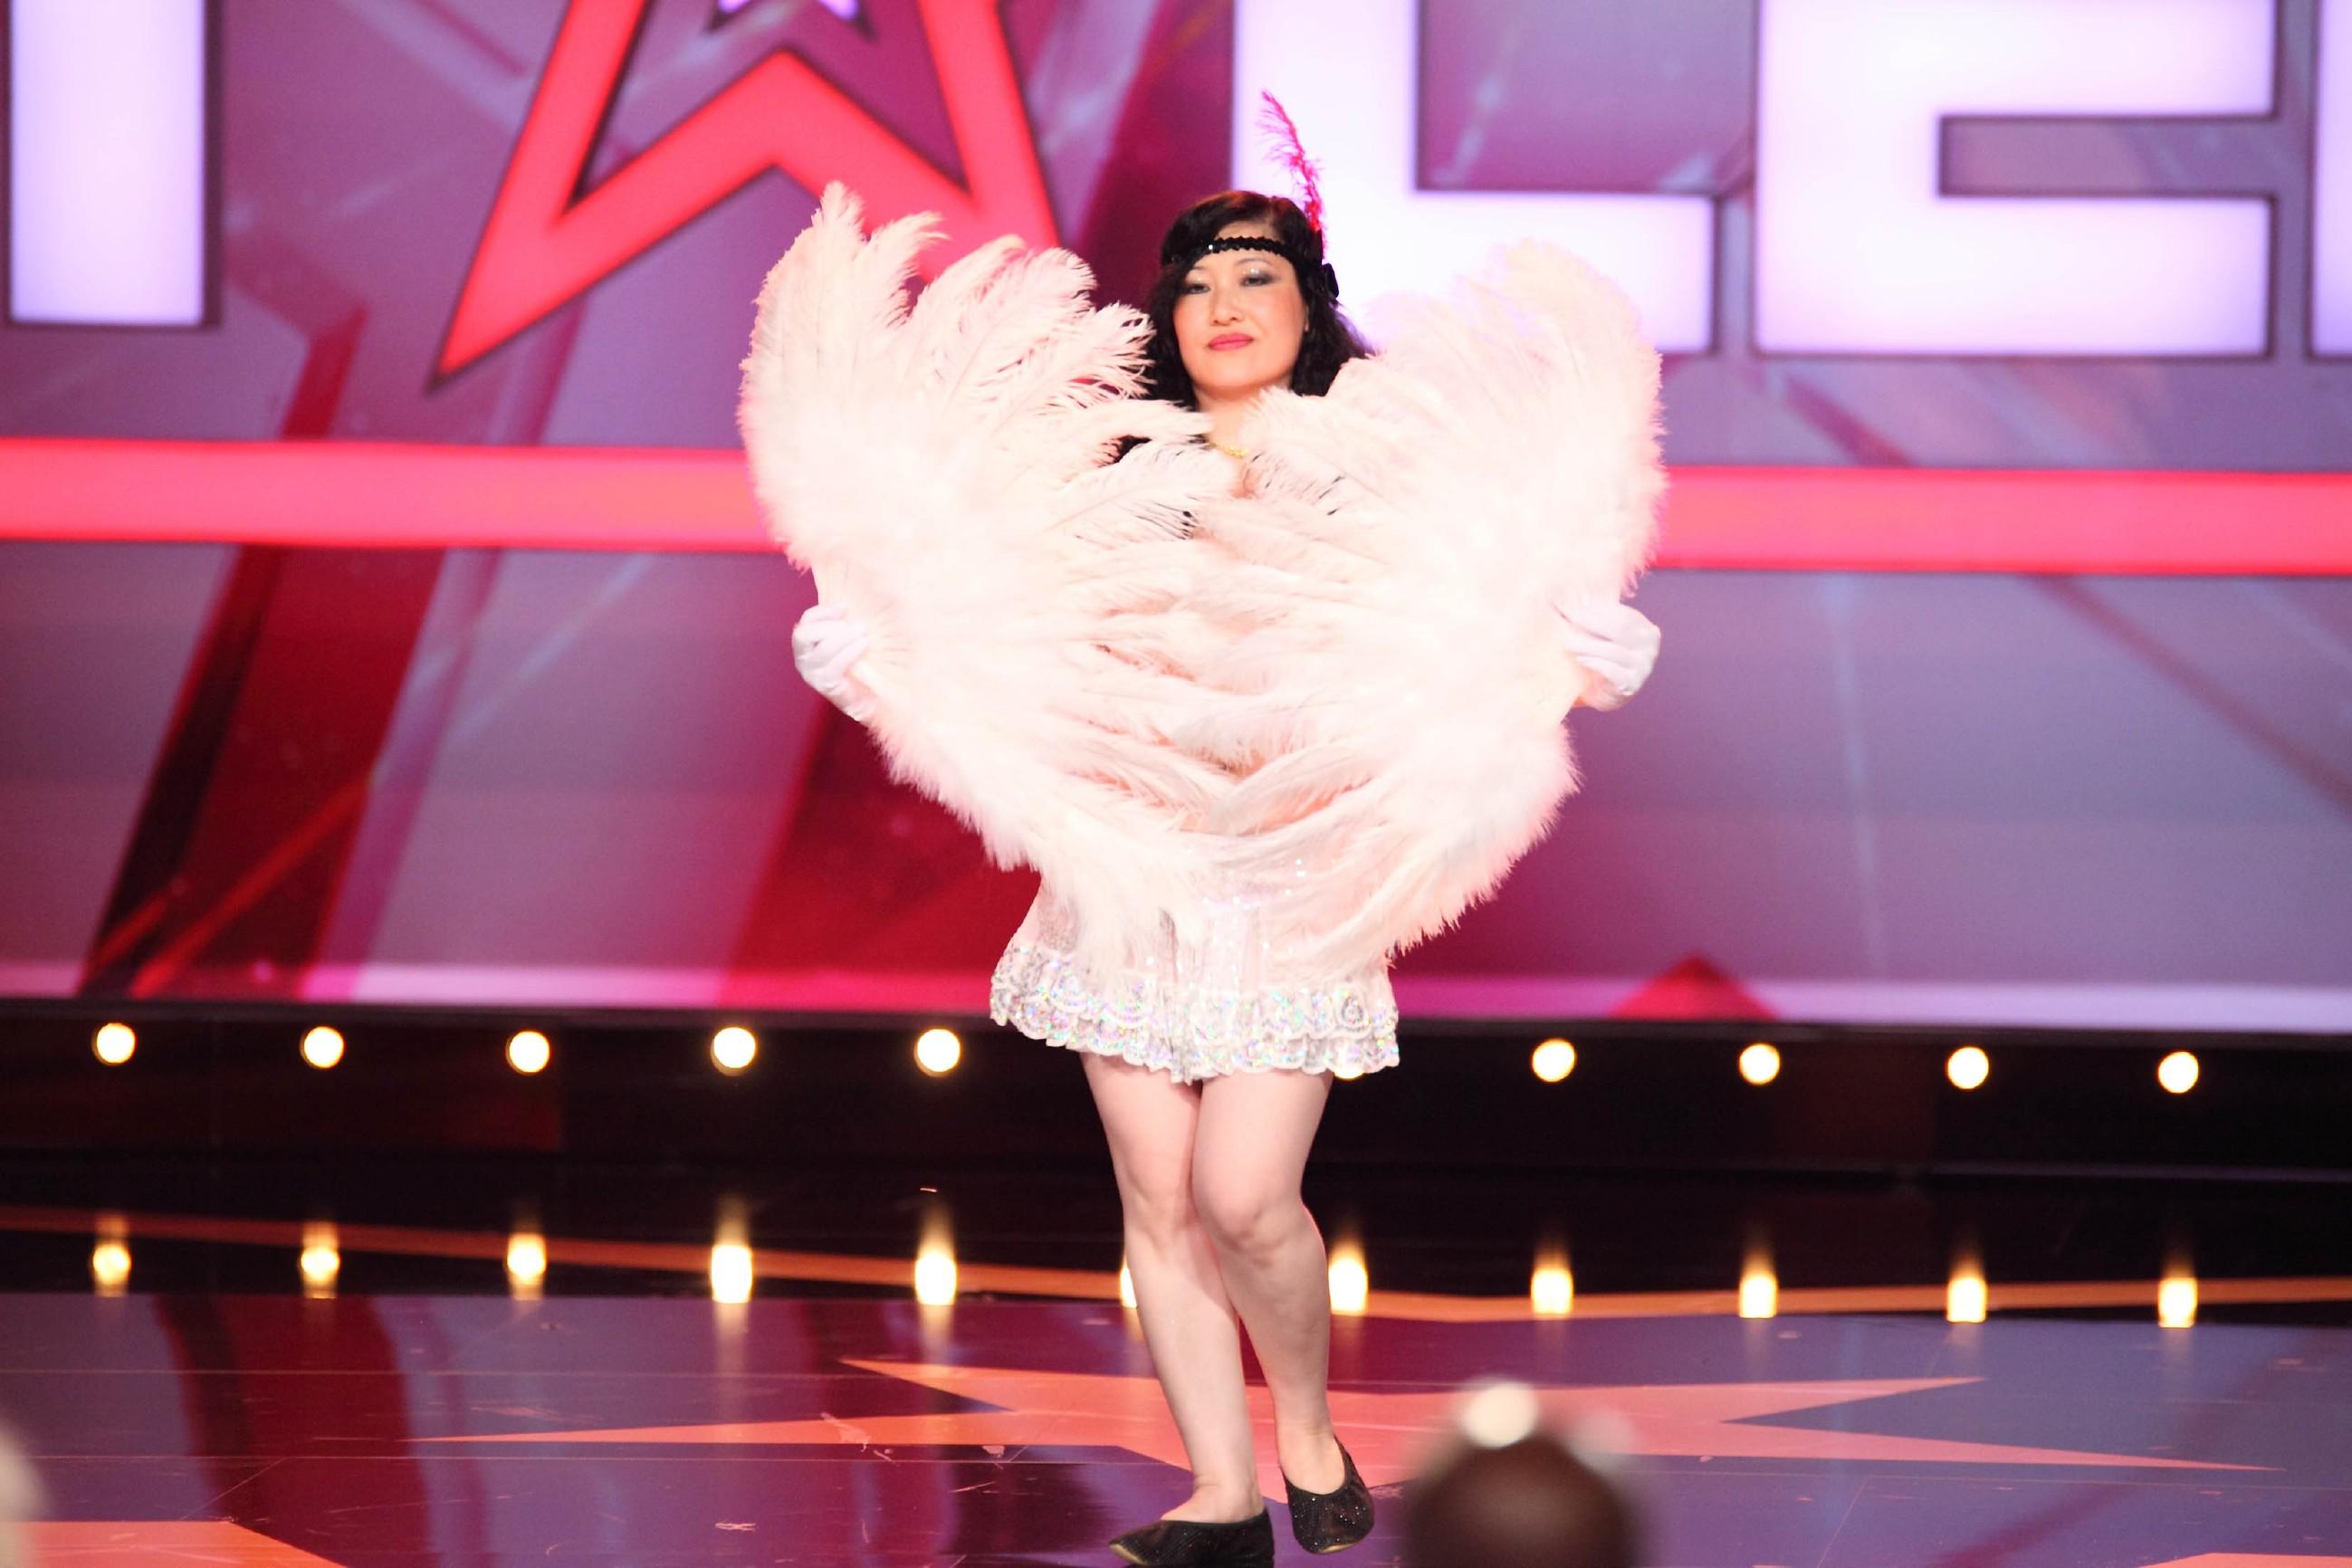 Das Supertalent 2015 Show 5 - Xuan Lande